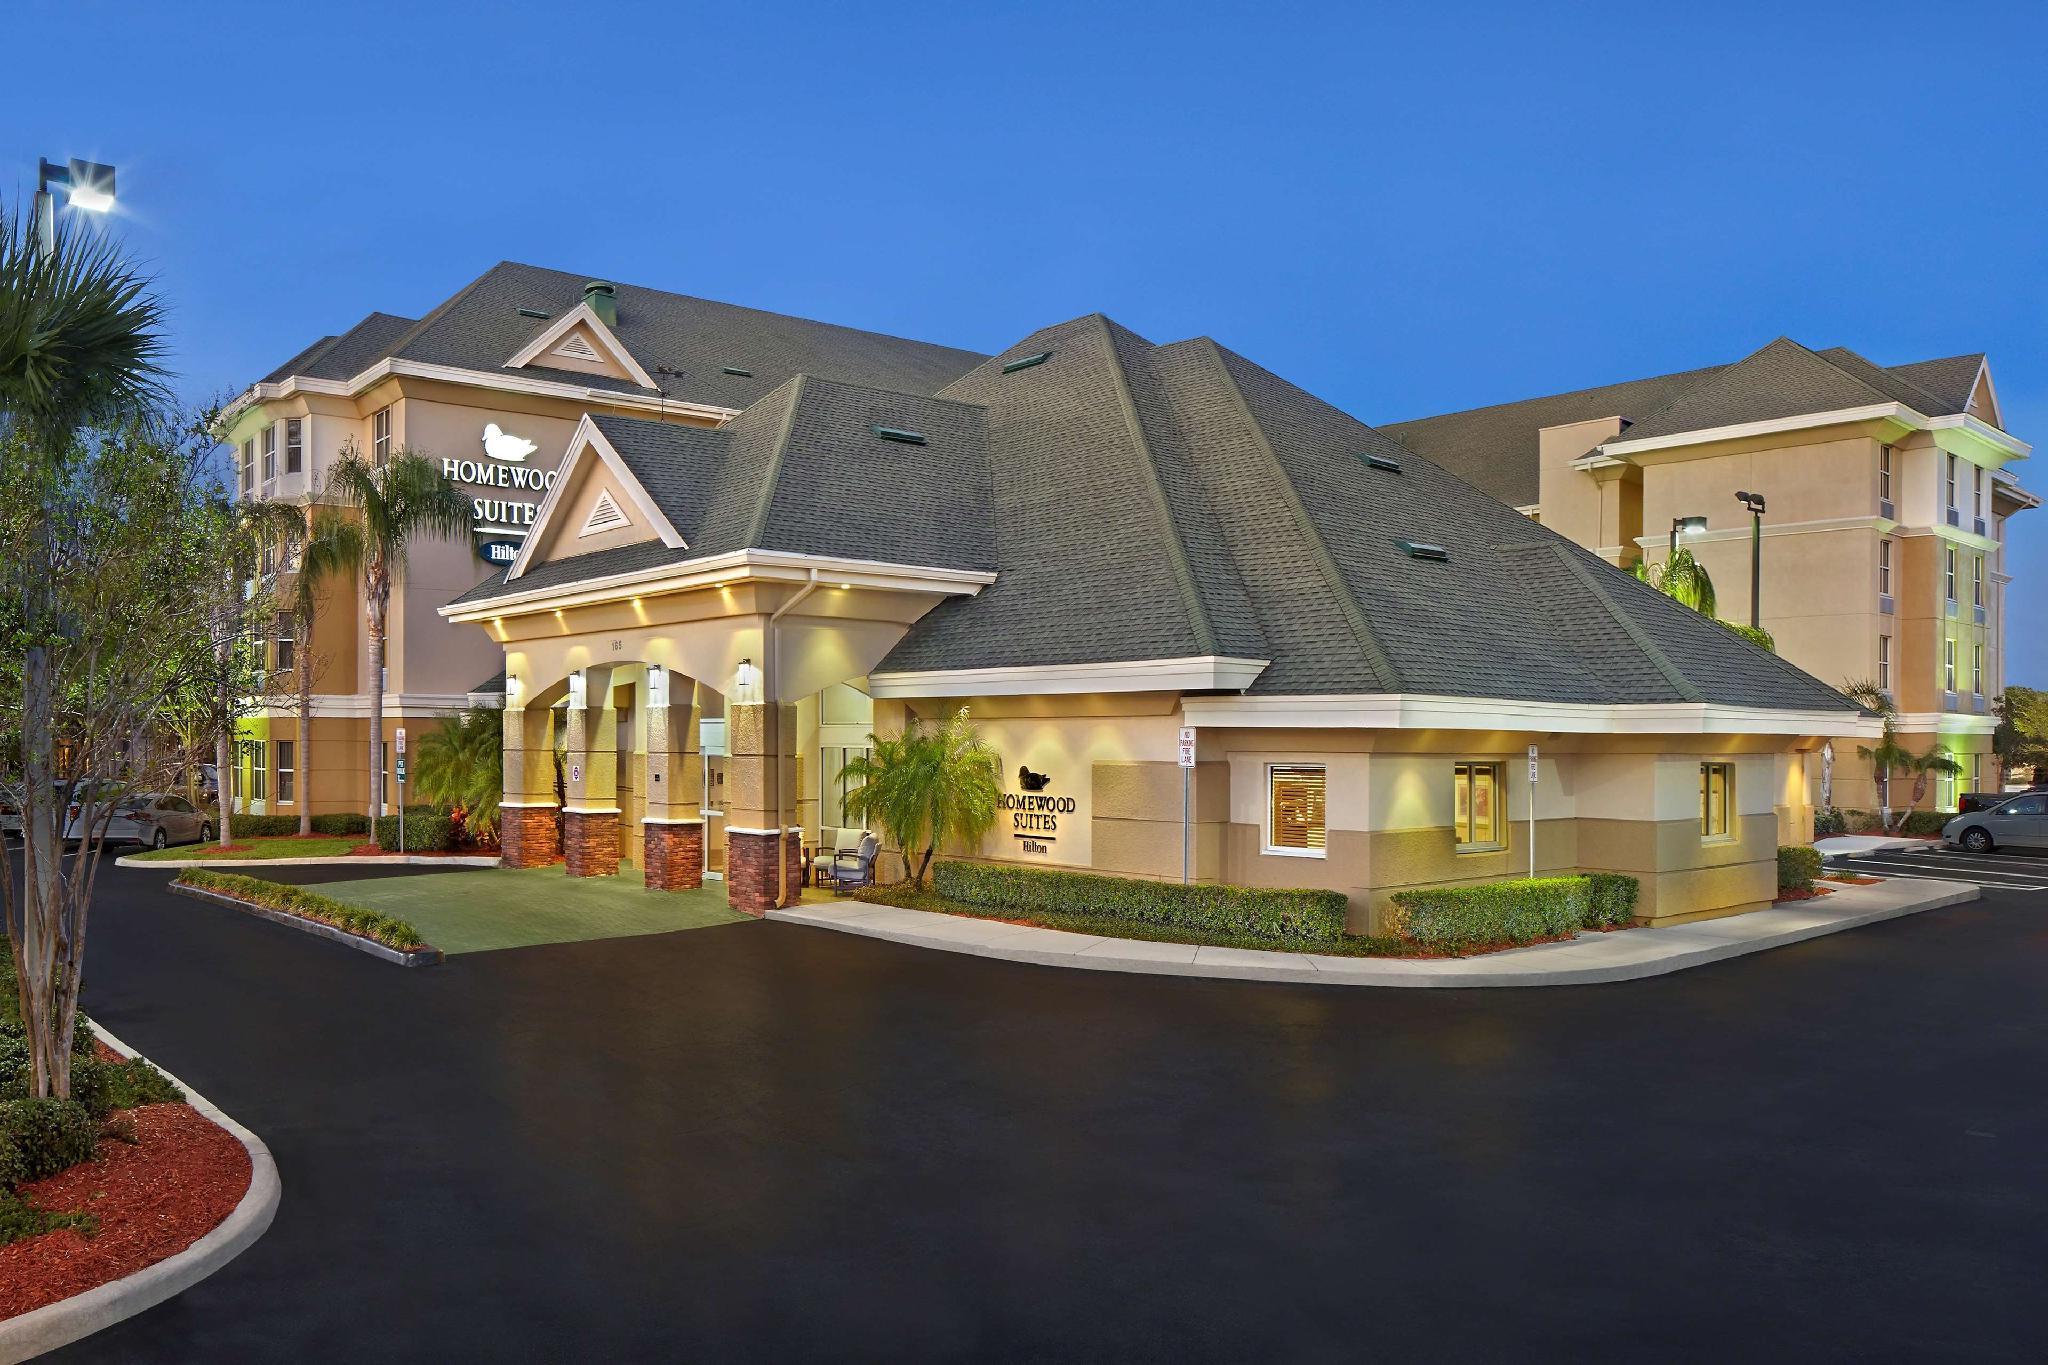 Homewood Suites By Hilton Daytona Beach Speedway Airport Hotel